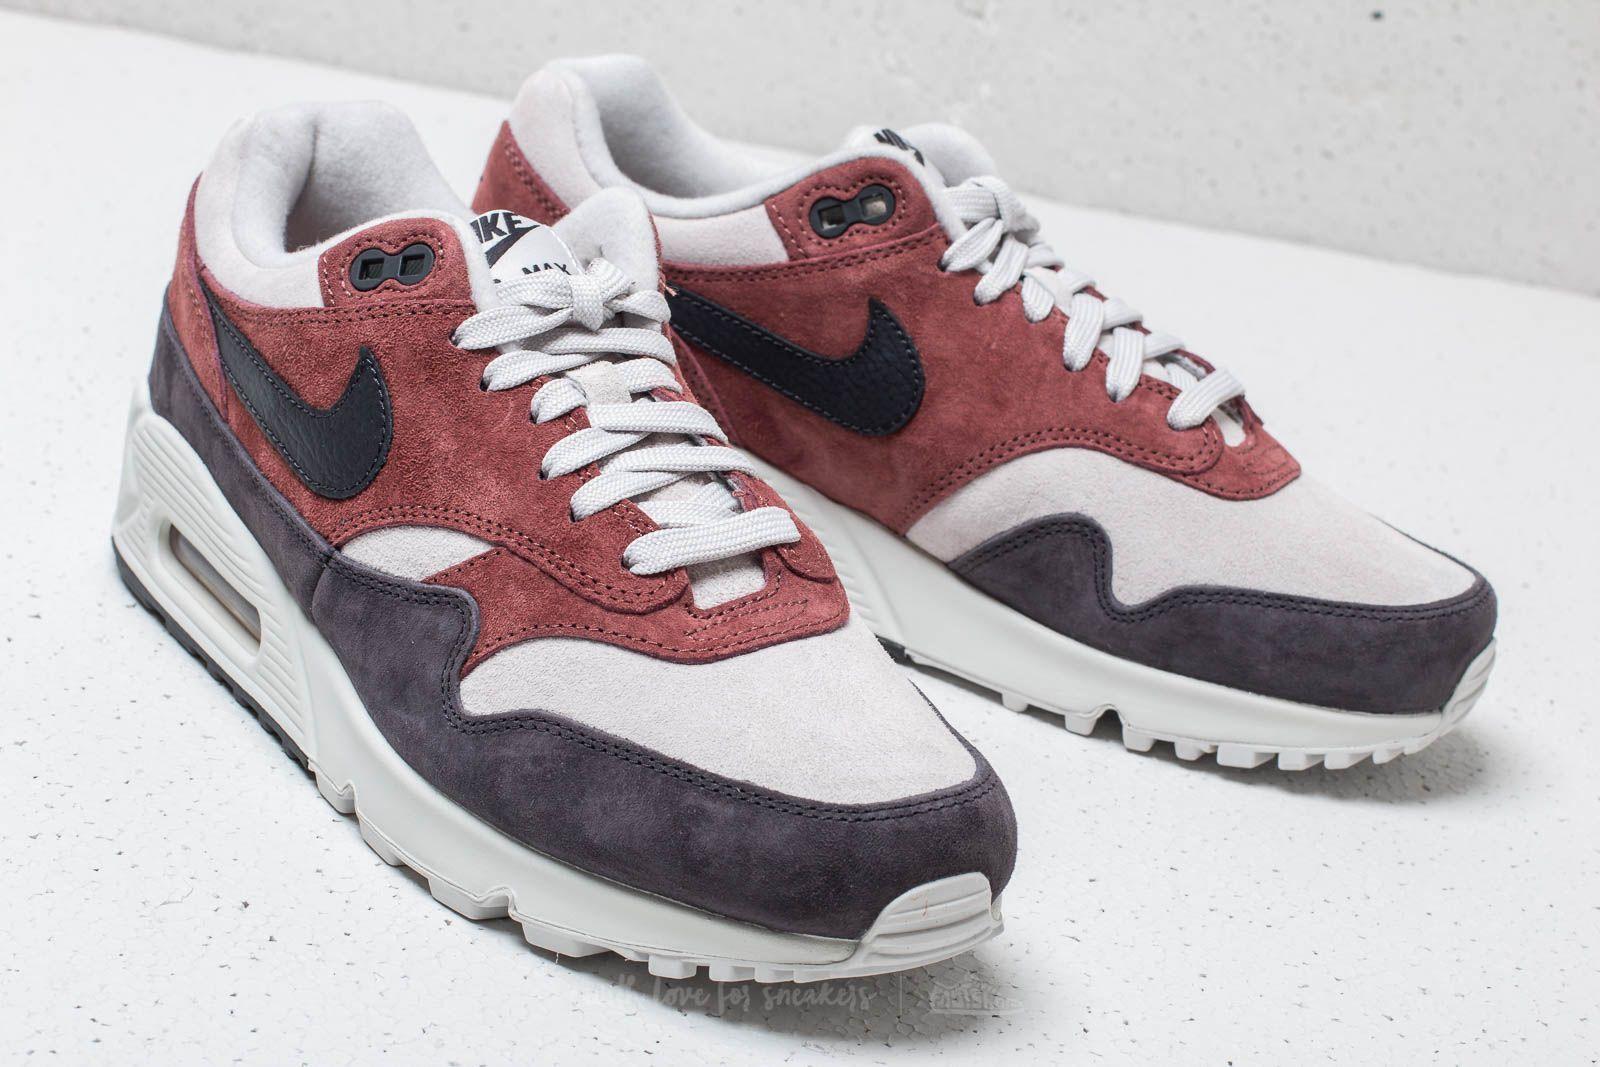 Nike W Air Max 90  1 Red Sepia  Oil Grey-Vast Grey la un preț excelent 697  Lei cumpără la Footshop 8e72cd4e3